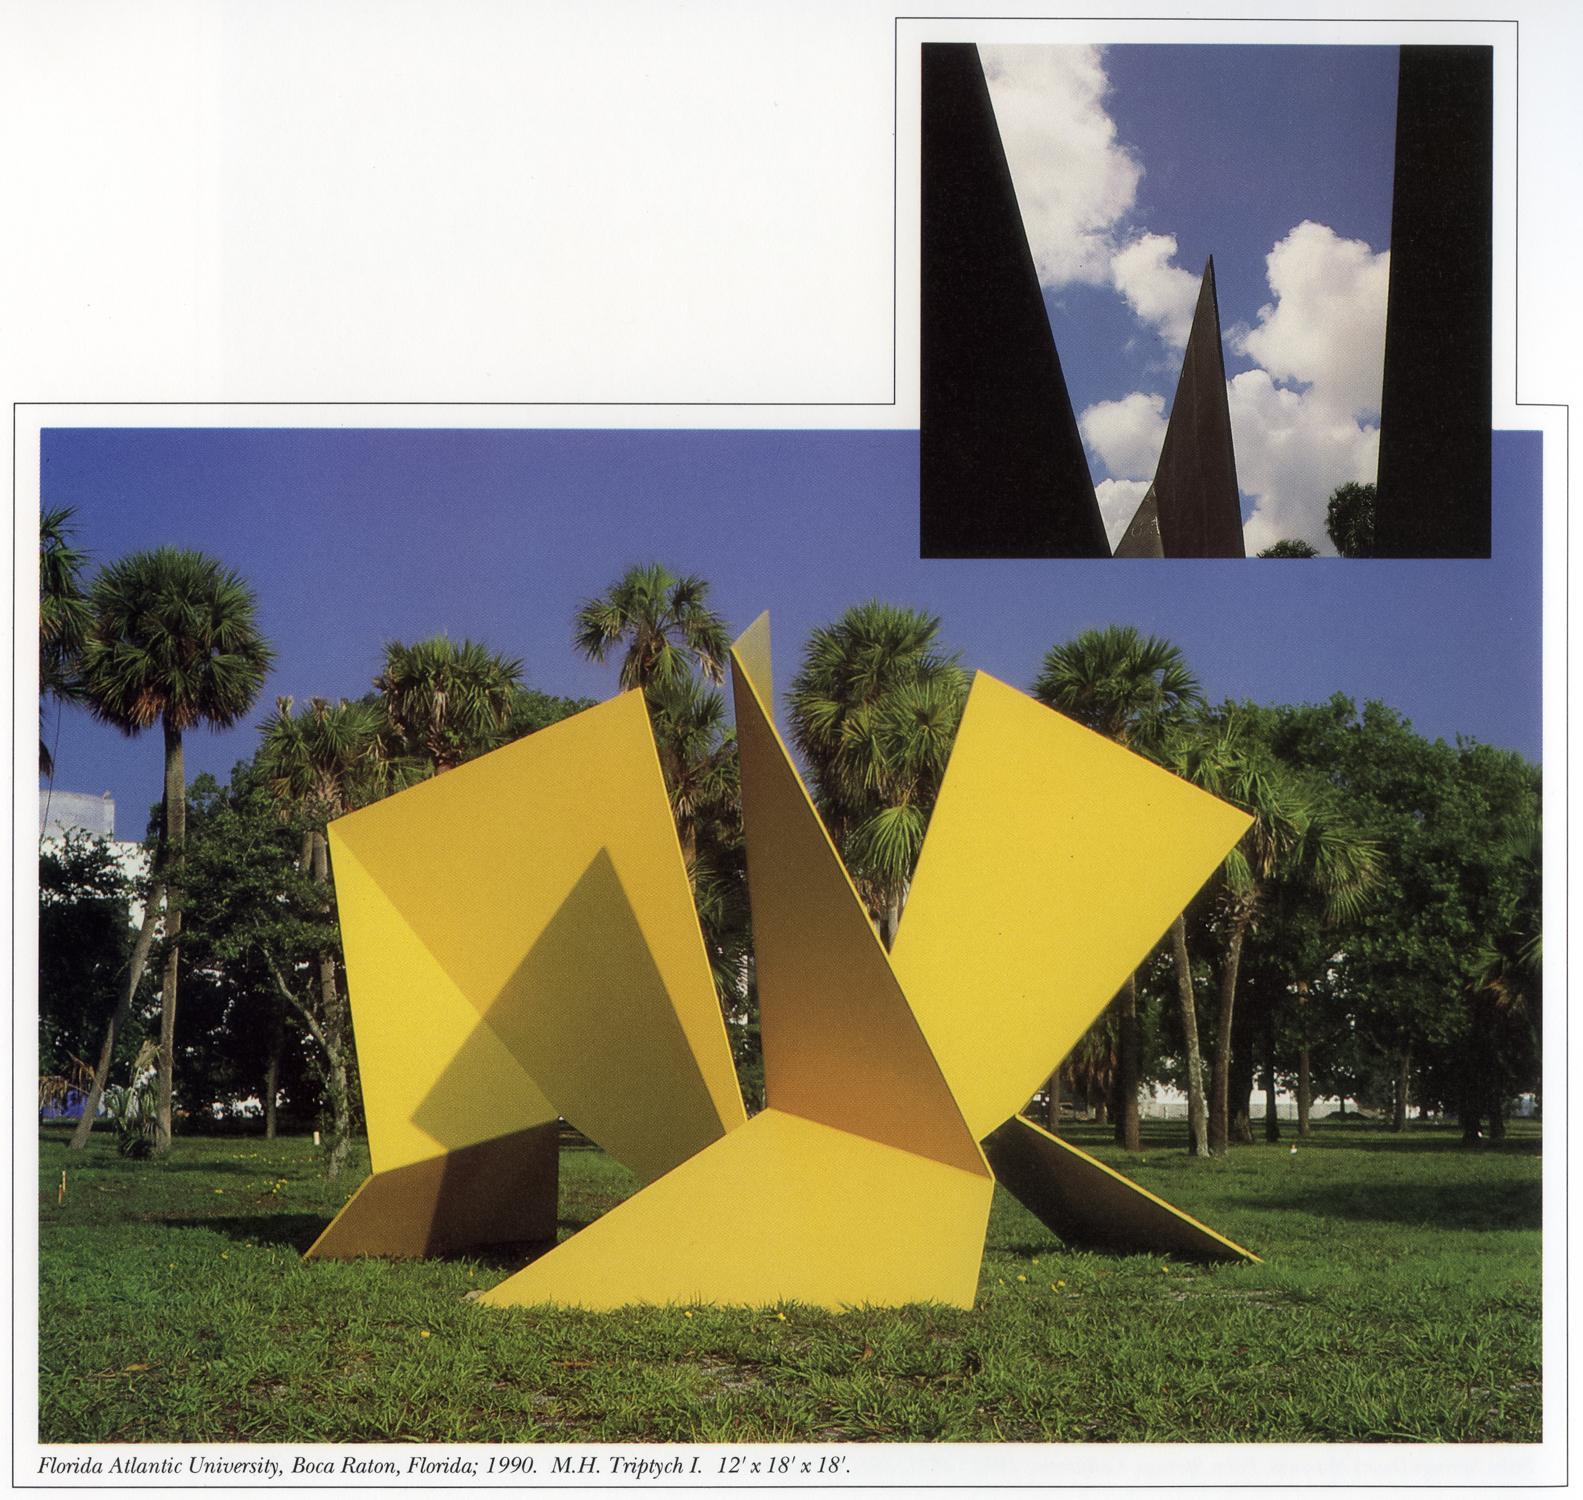 Florida Atlantic University, Boca Raton, Florida; 1990.  M.H. Triptych I.  12' x 18' x 18'.